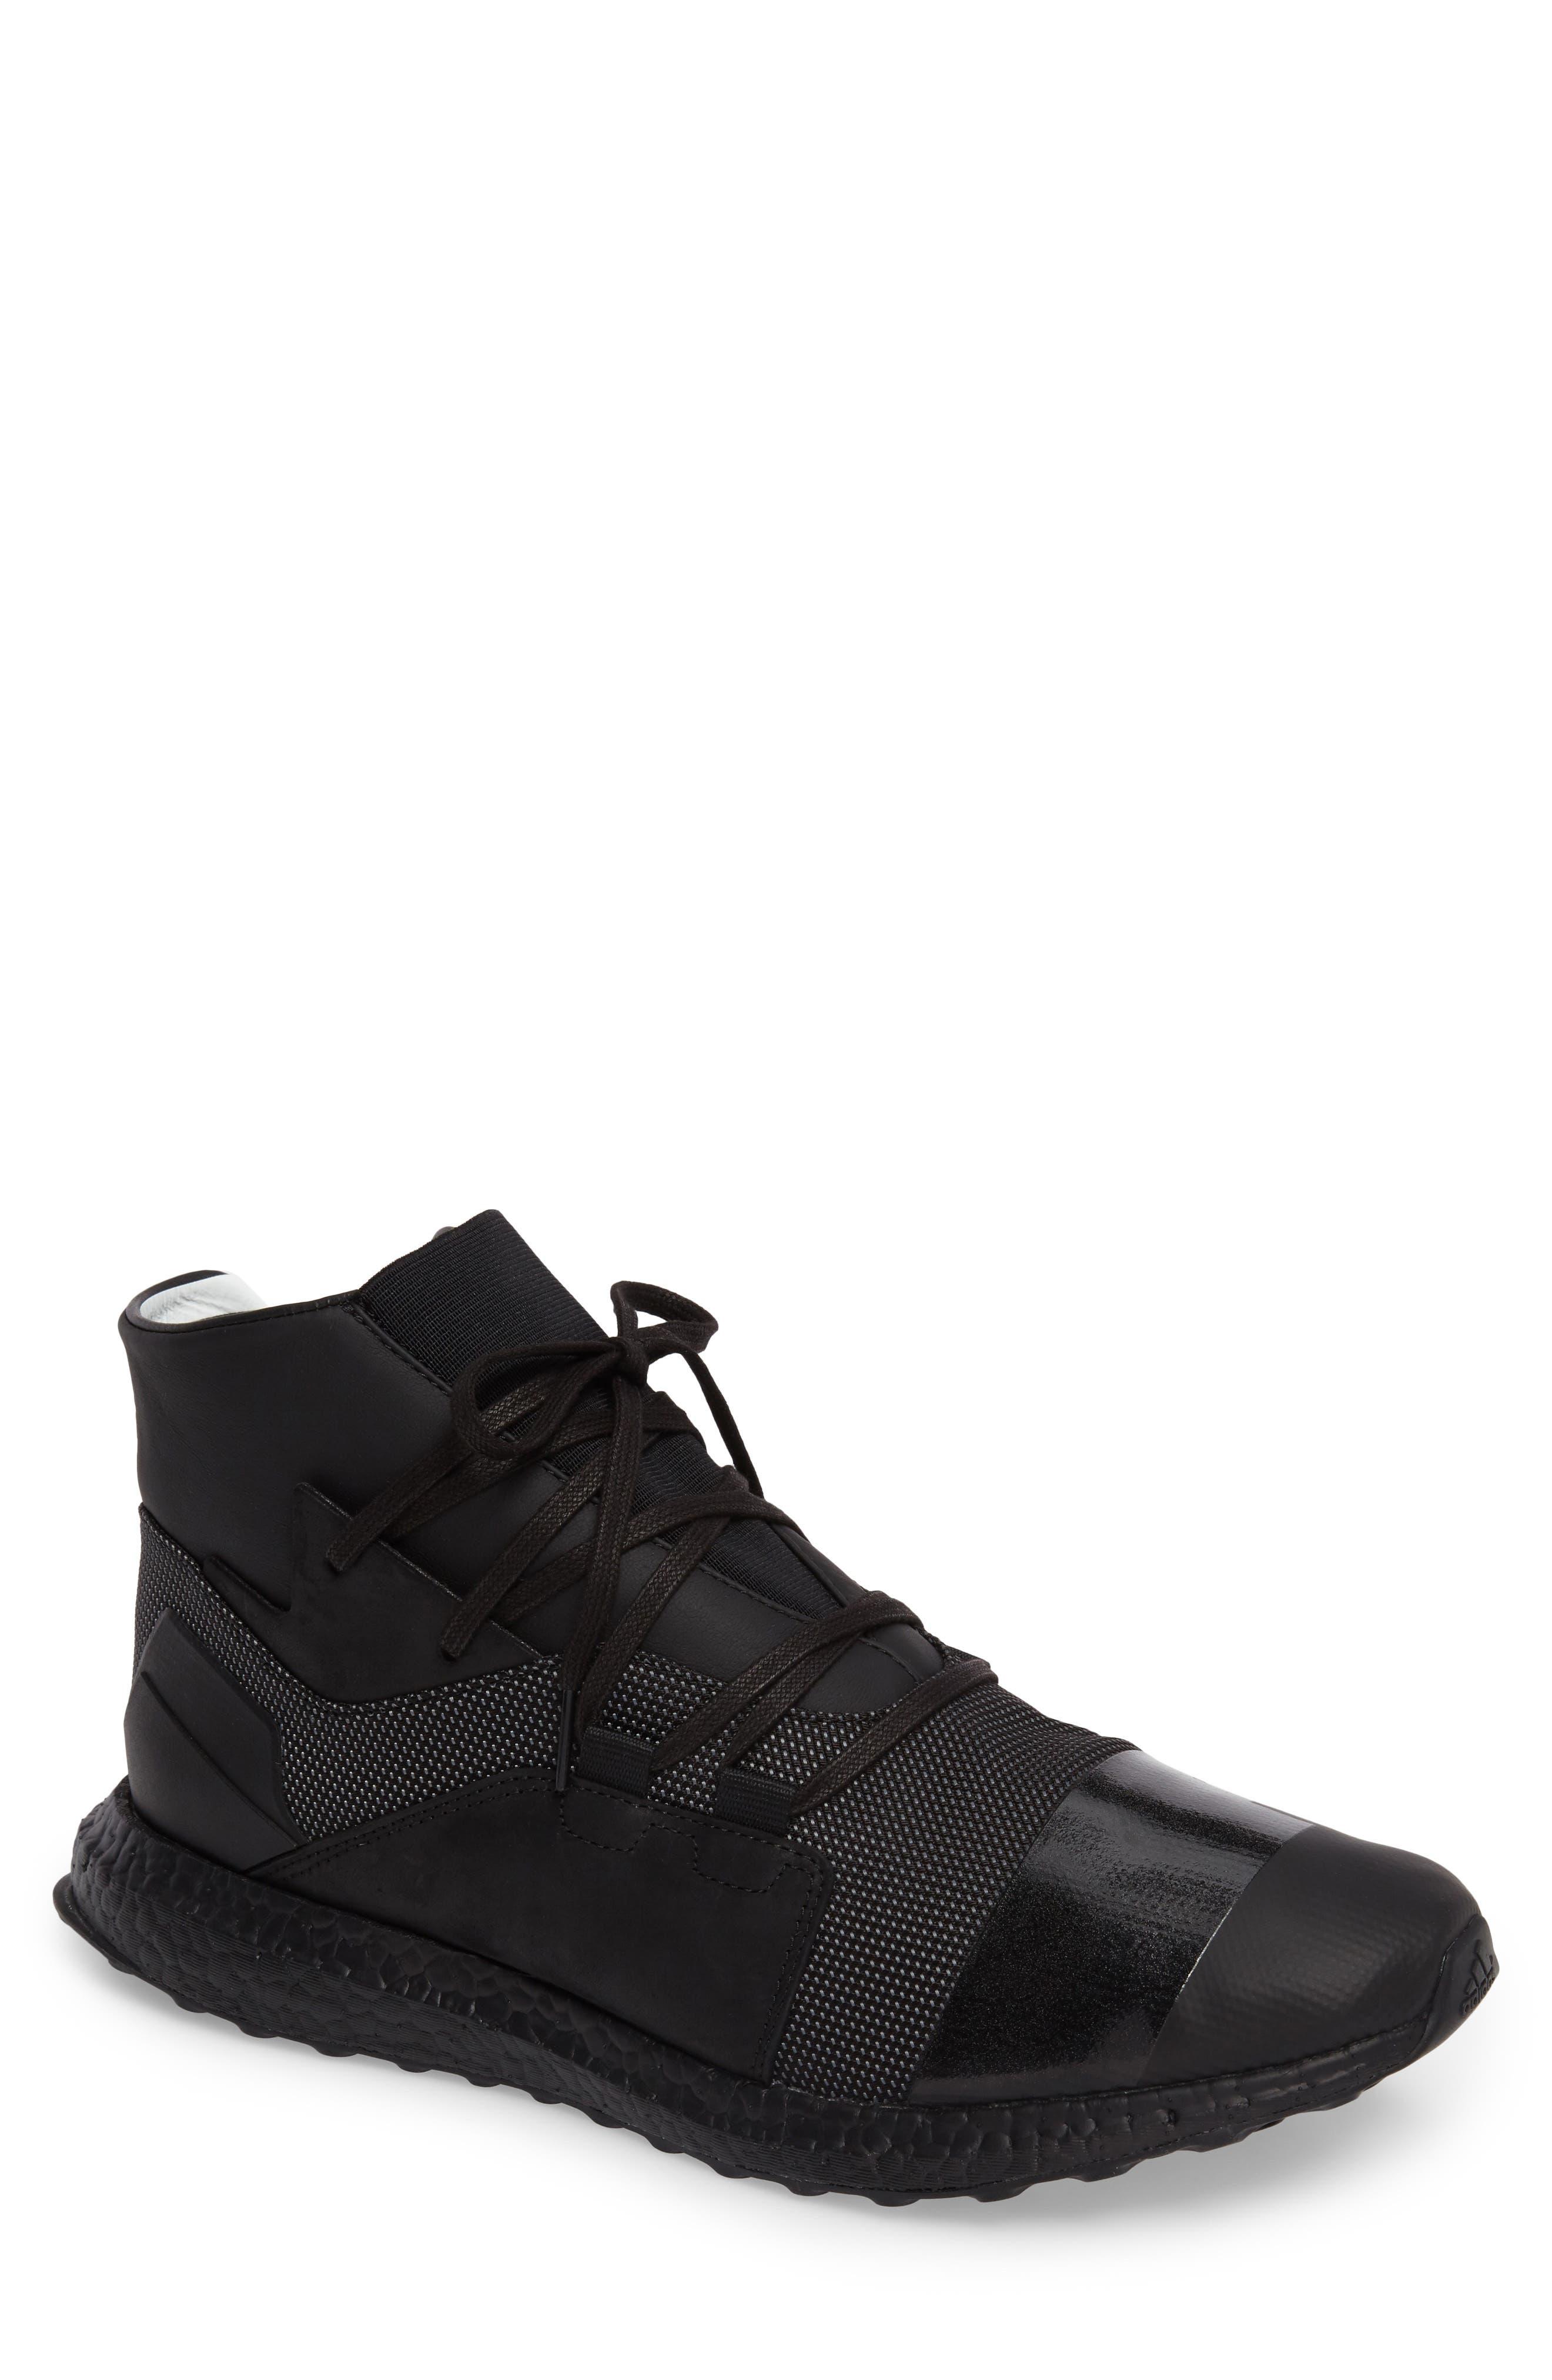 Y-3 Kozoko High Sneaker (Men)